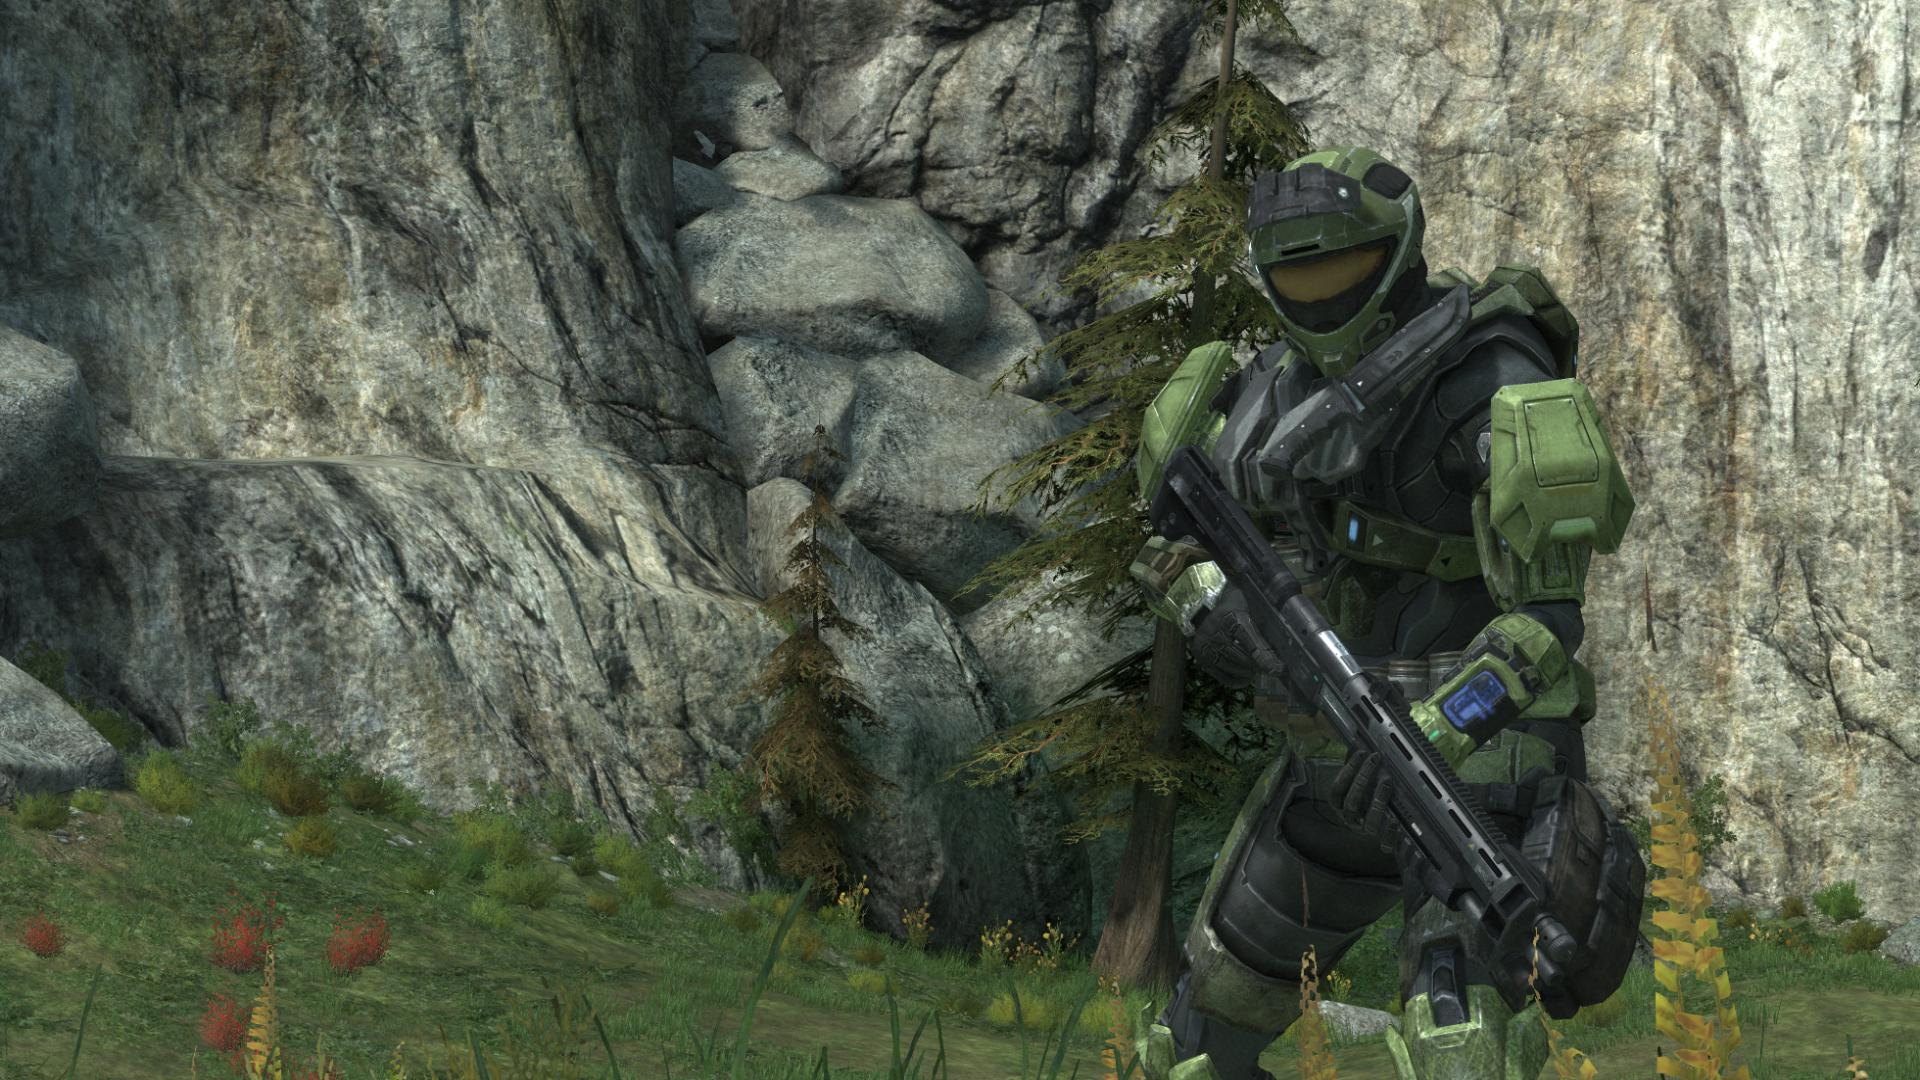 Forum:Halo Reach Image Service ALL ARMOR UNLOCKED! | Halo